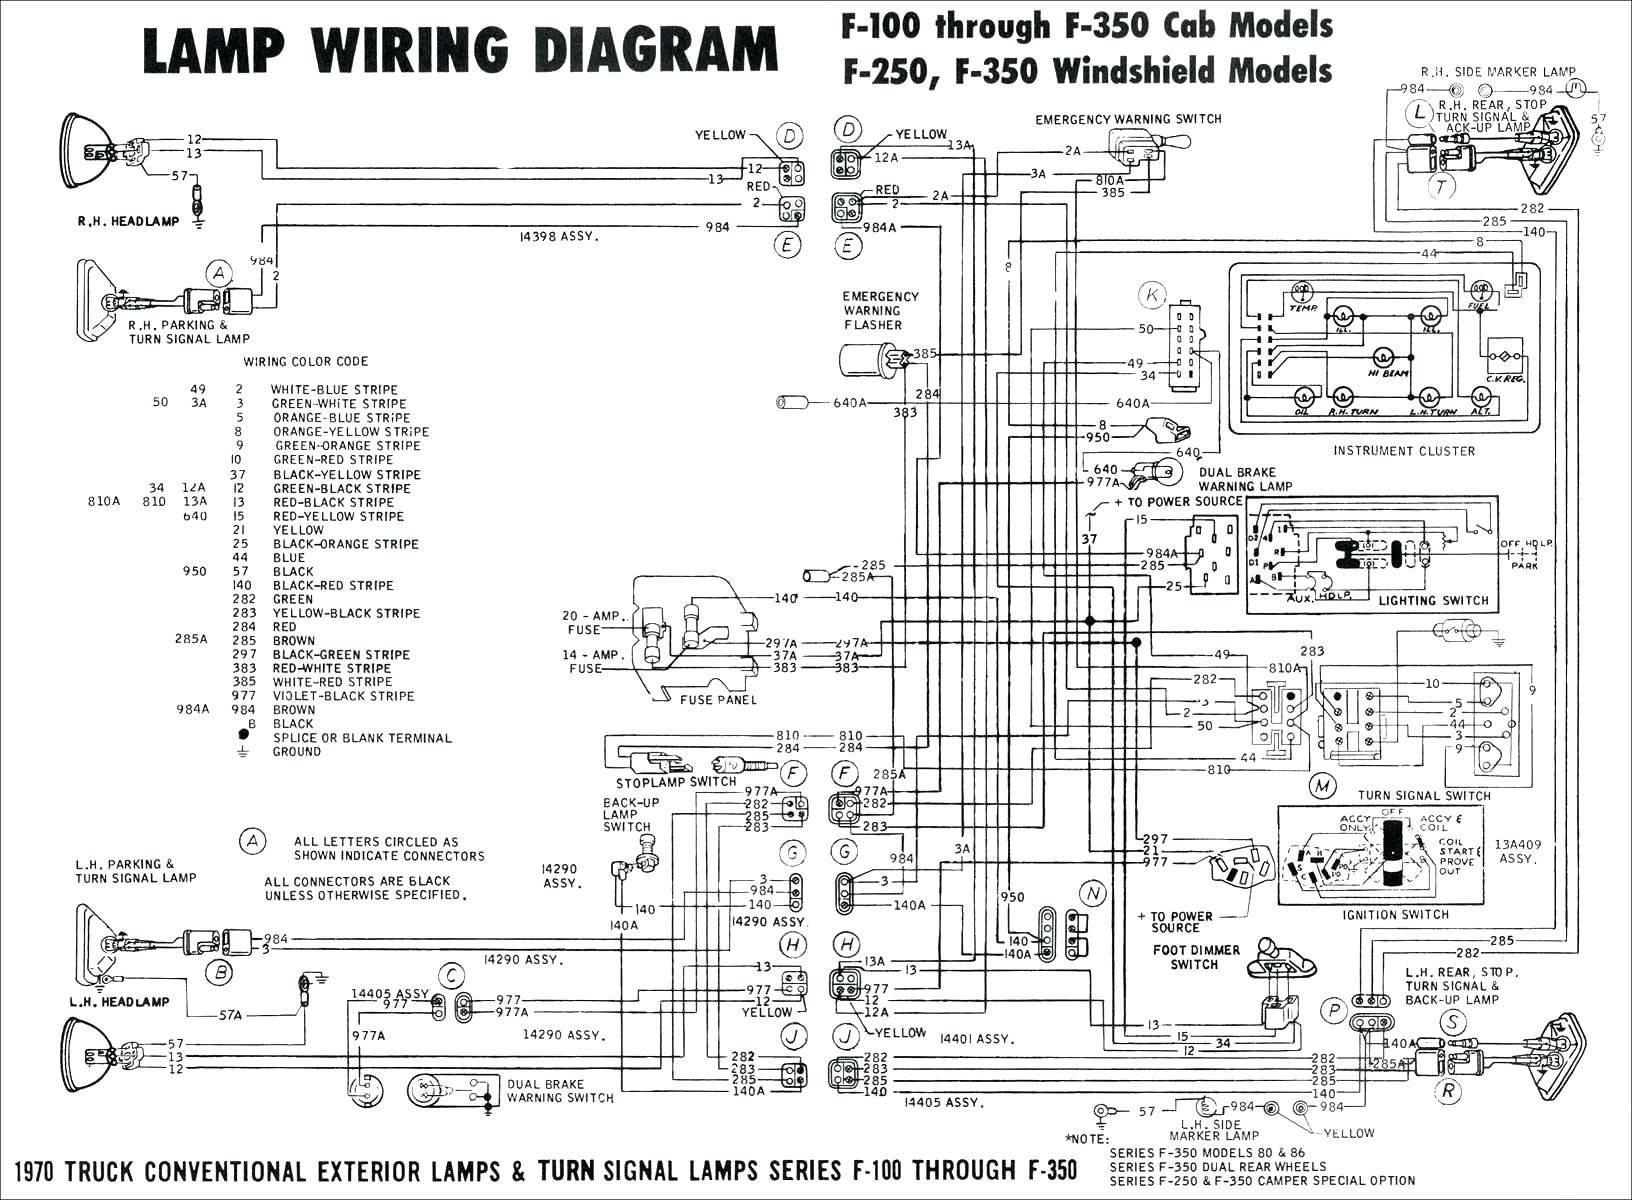 Jeep Grand Cherokee Wiring Diagram | Free Wiring Diagram on jeep 4.0 engine wiring diagram, jeep ac condenser replacement, jeep xj wiring diagram, jeep stereo wiring diagram, jeep jk wiring diagram, jeep tj wiring diagram, jeep cj wiring diagram,